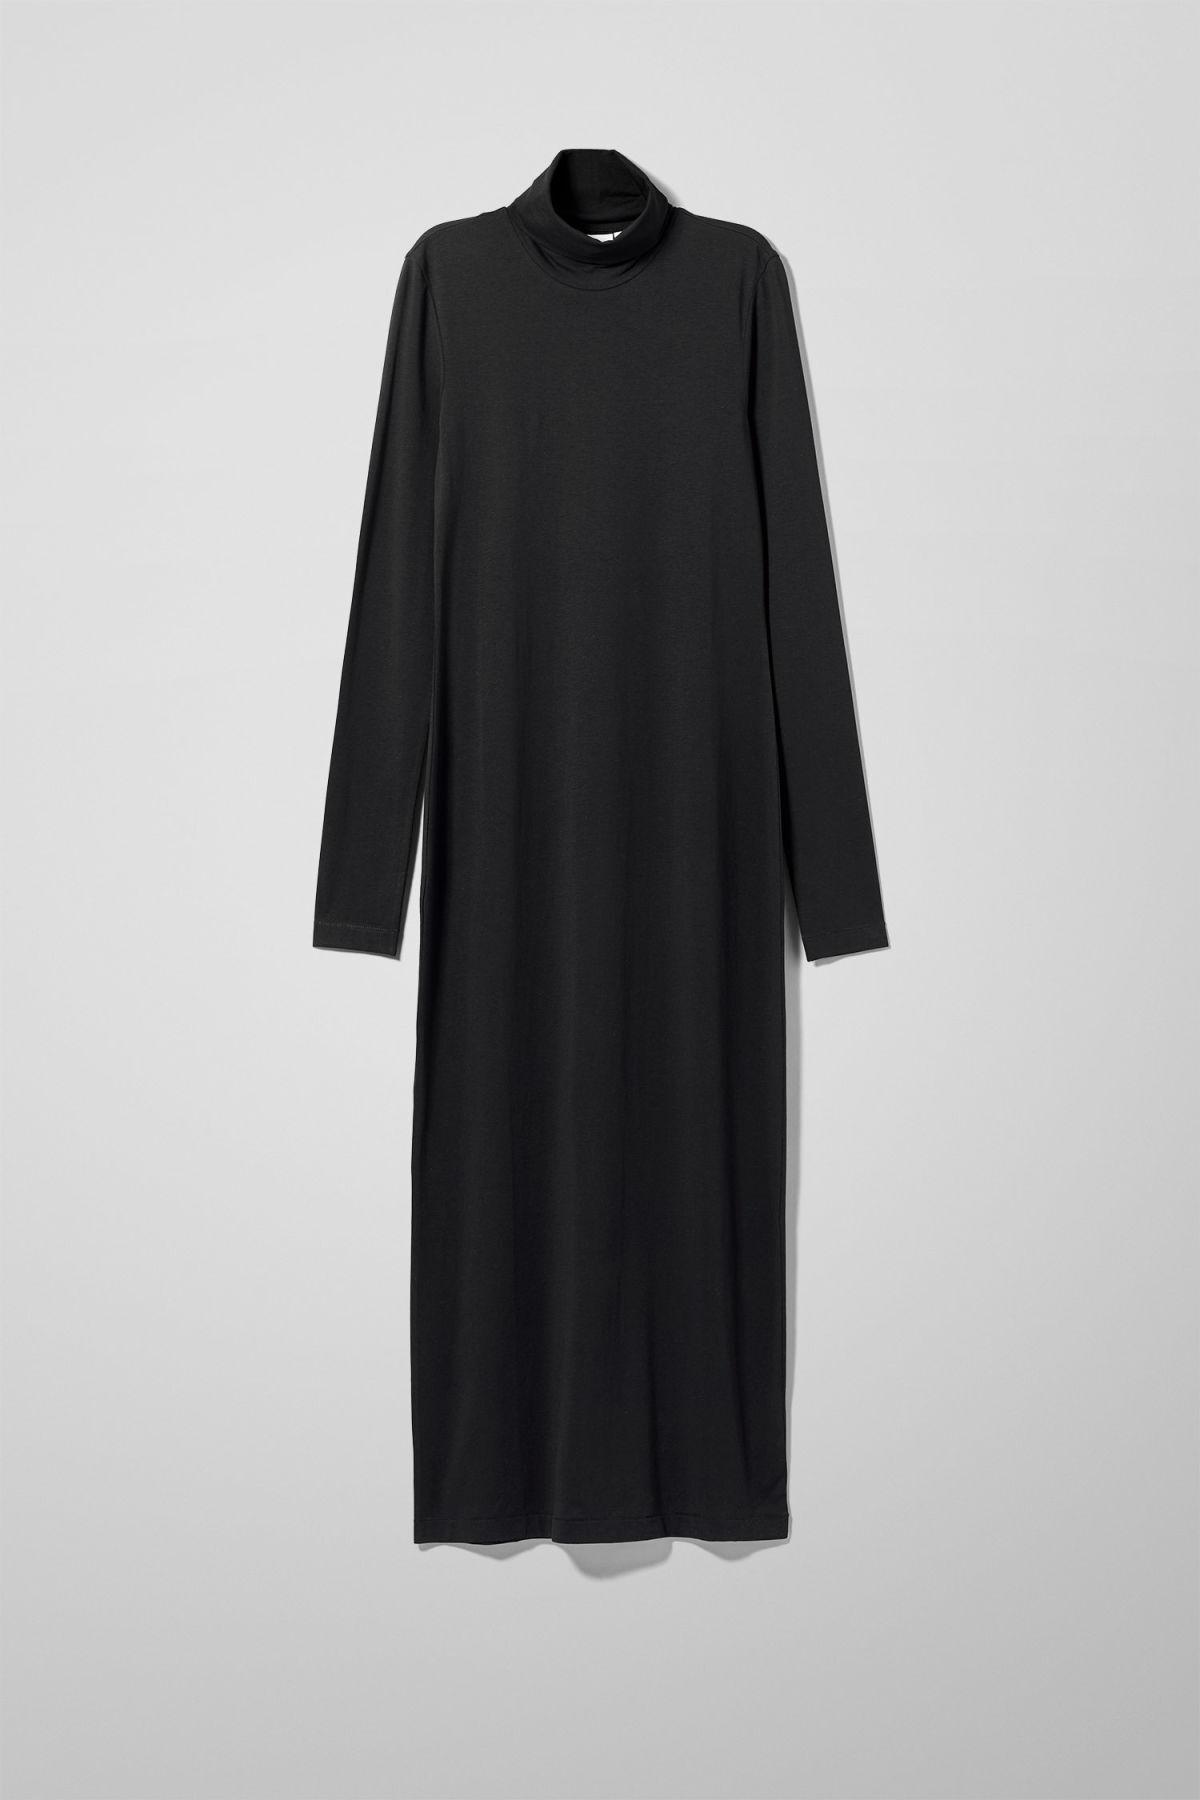 Image of Maxine Dress - Black-M